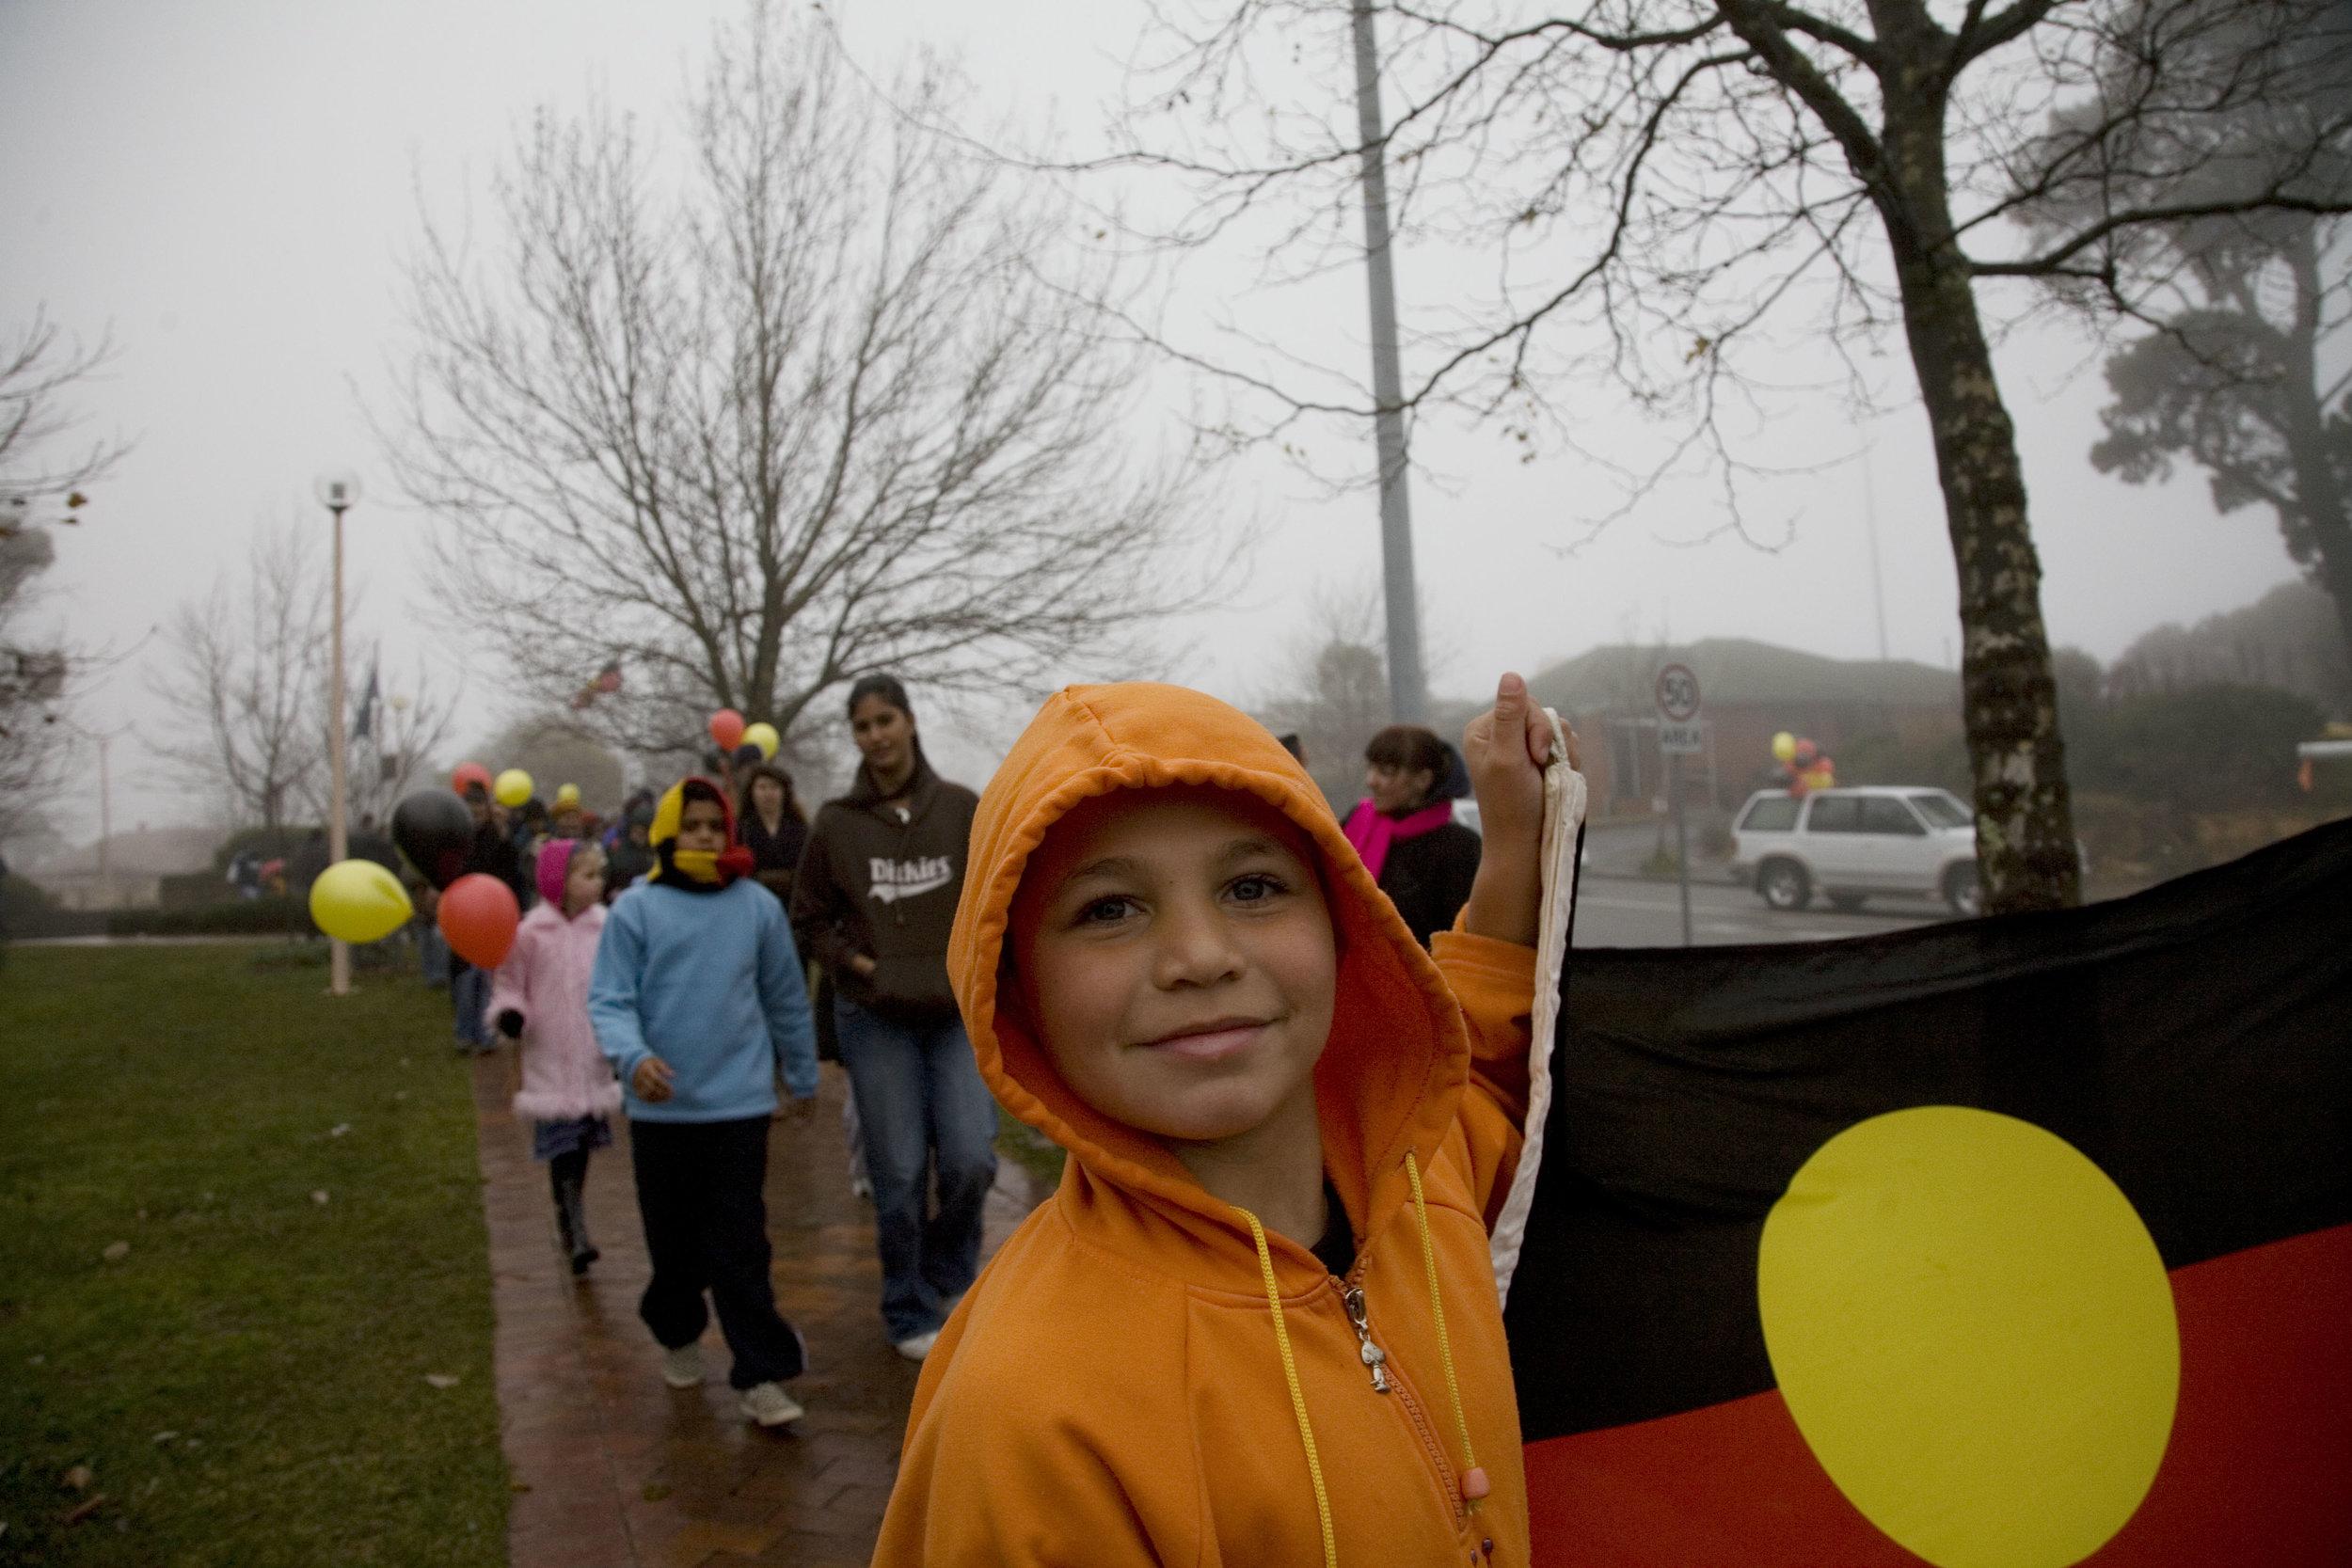 Proud of Aboriginal culture. Boy with Aboriginal flag